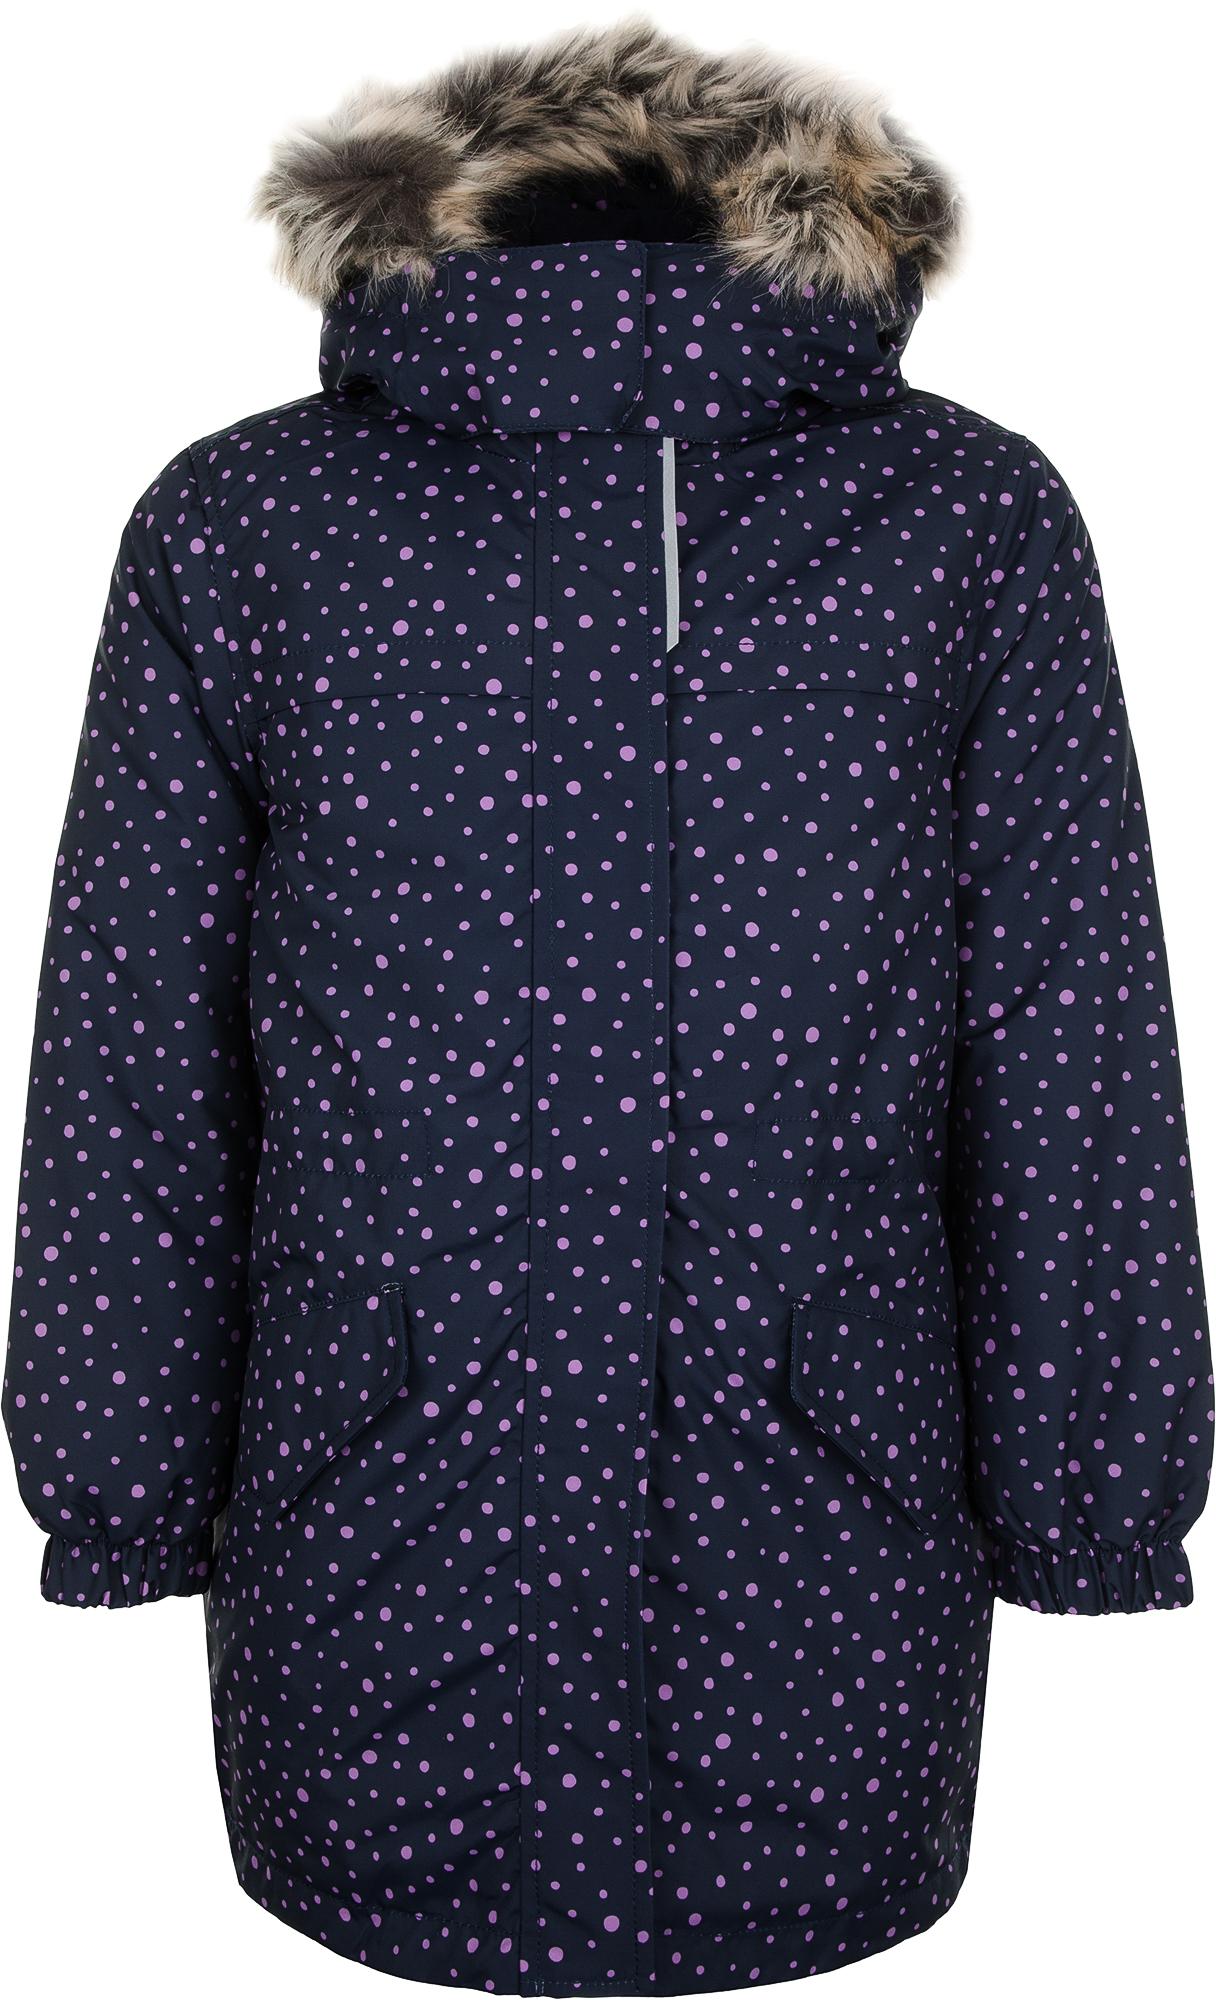 цена на Lassie Куртка утепленная для девочек LASSIE Sira, размер 134